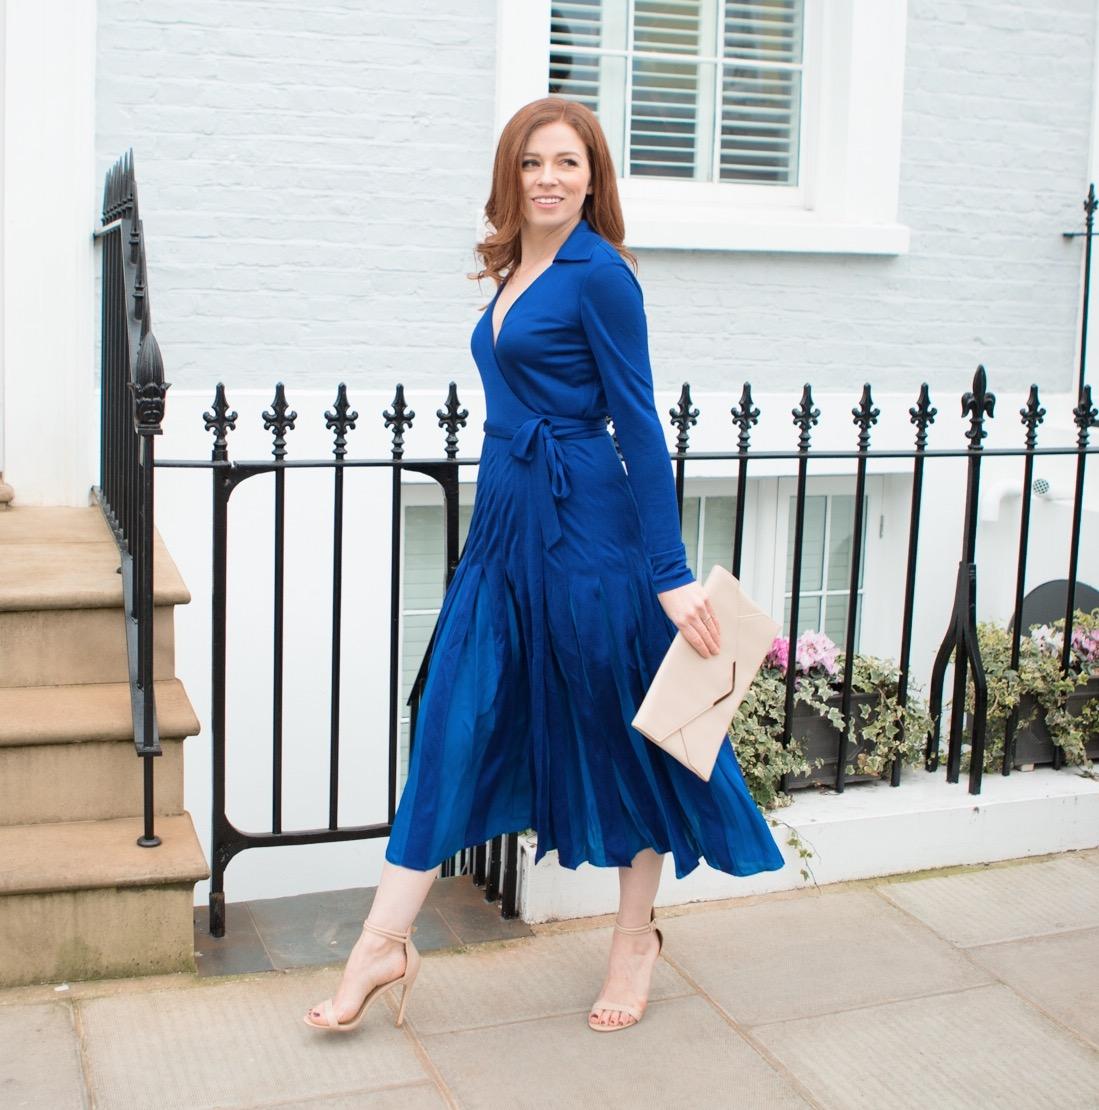 DVF Dress: Original Price £450 - Sample Sale Price £100